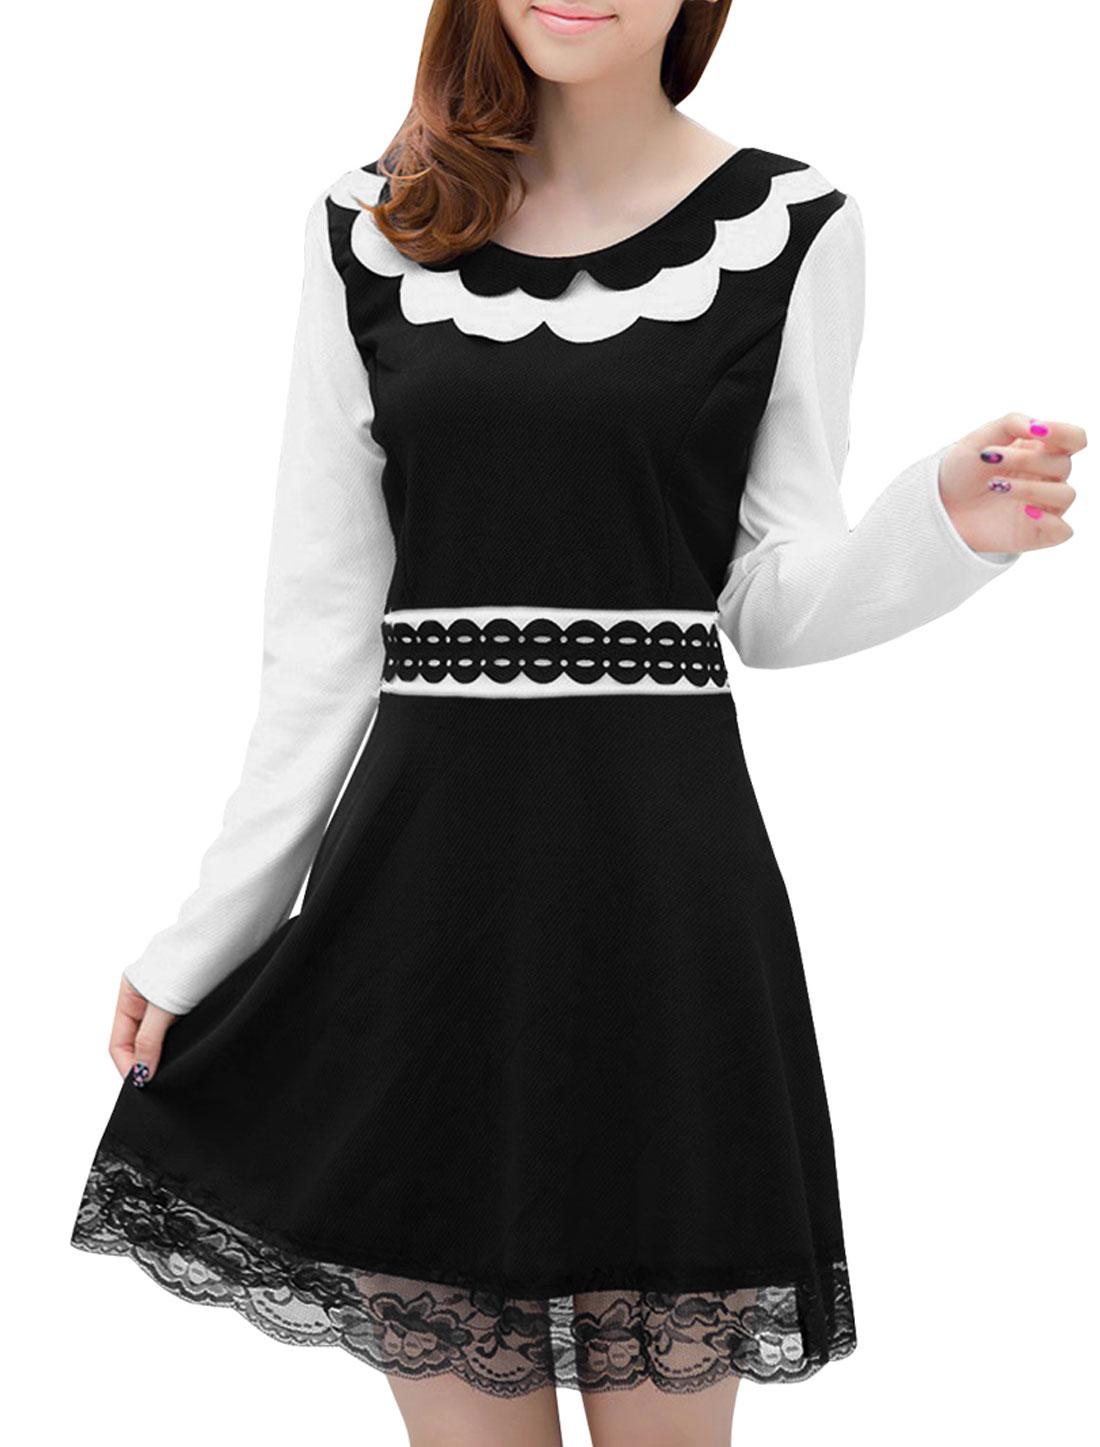 Lady Round Neck Long-sleeved Lace Panel Black White Dress XS